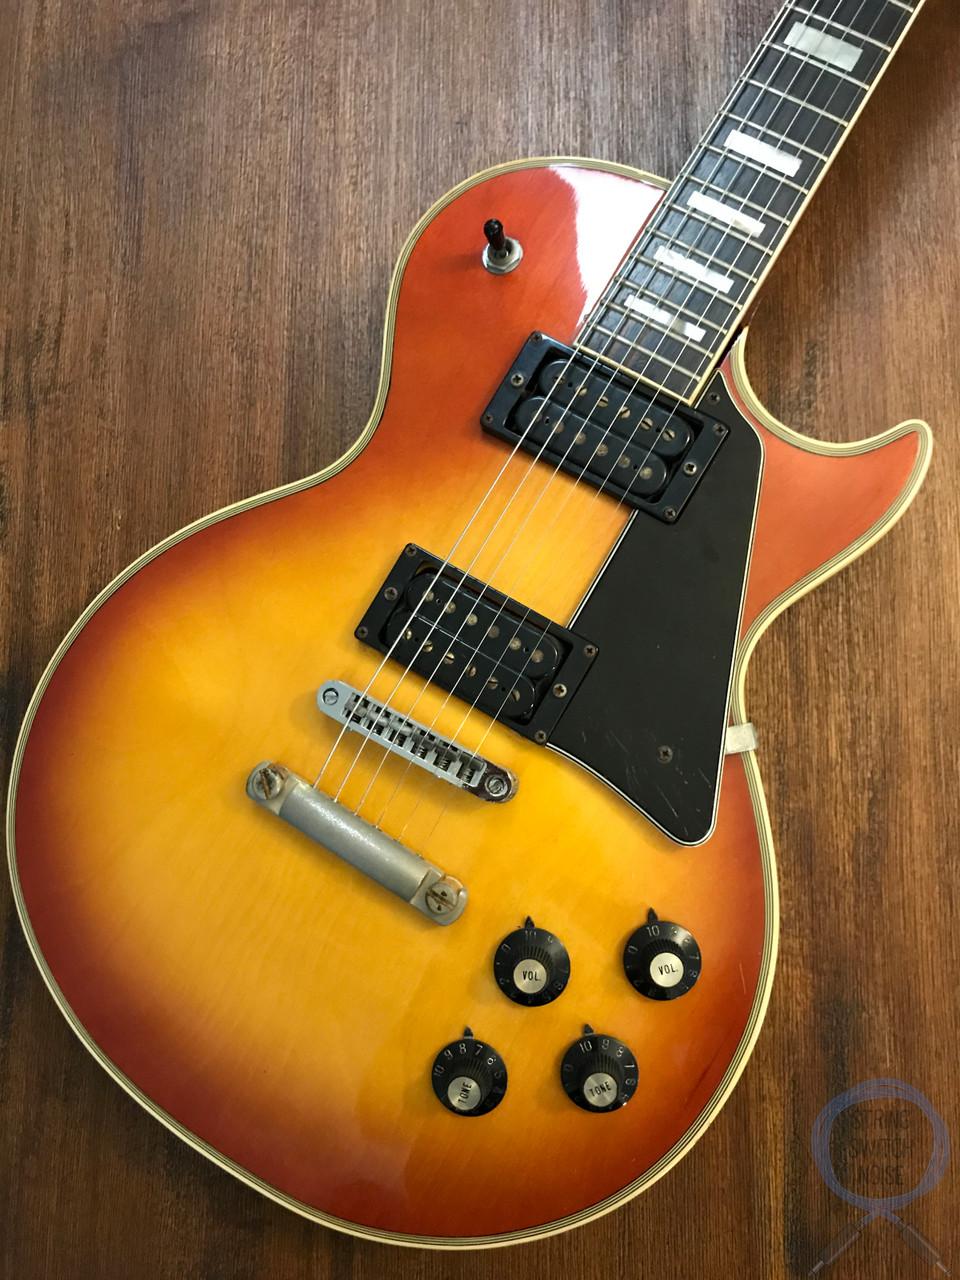 Greco Les Paul, Custom, Cherry Sunburst, 1974 Vintage, OHSC